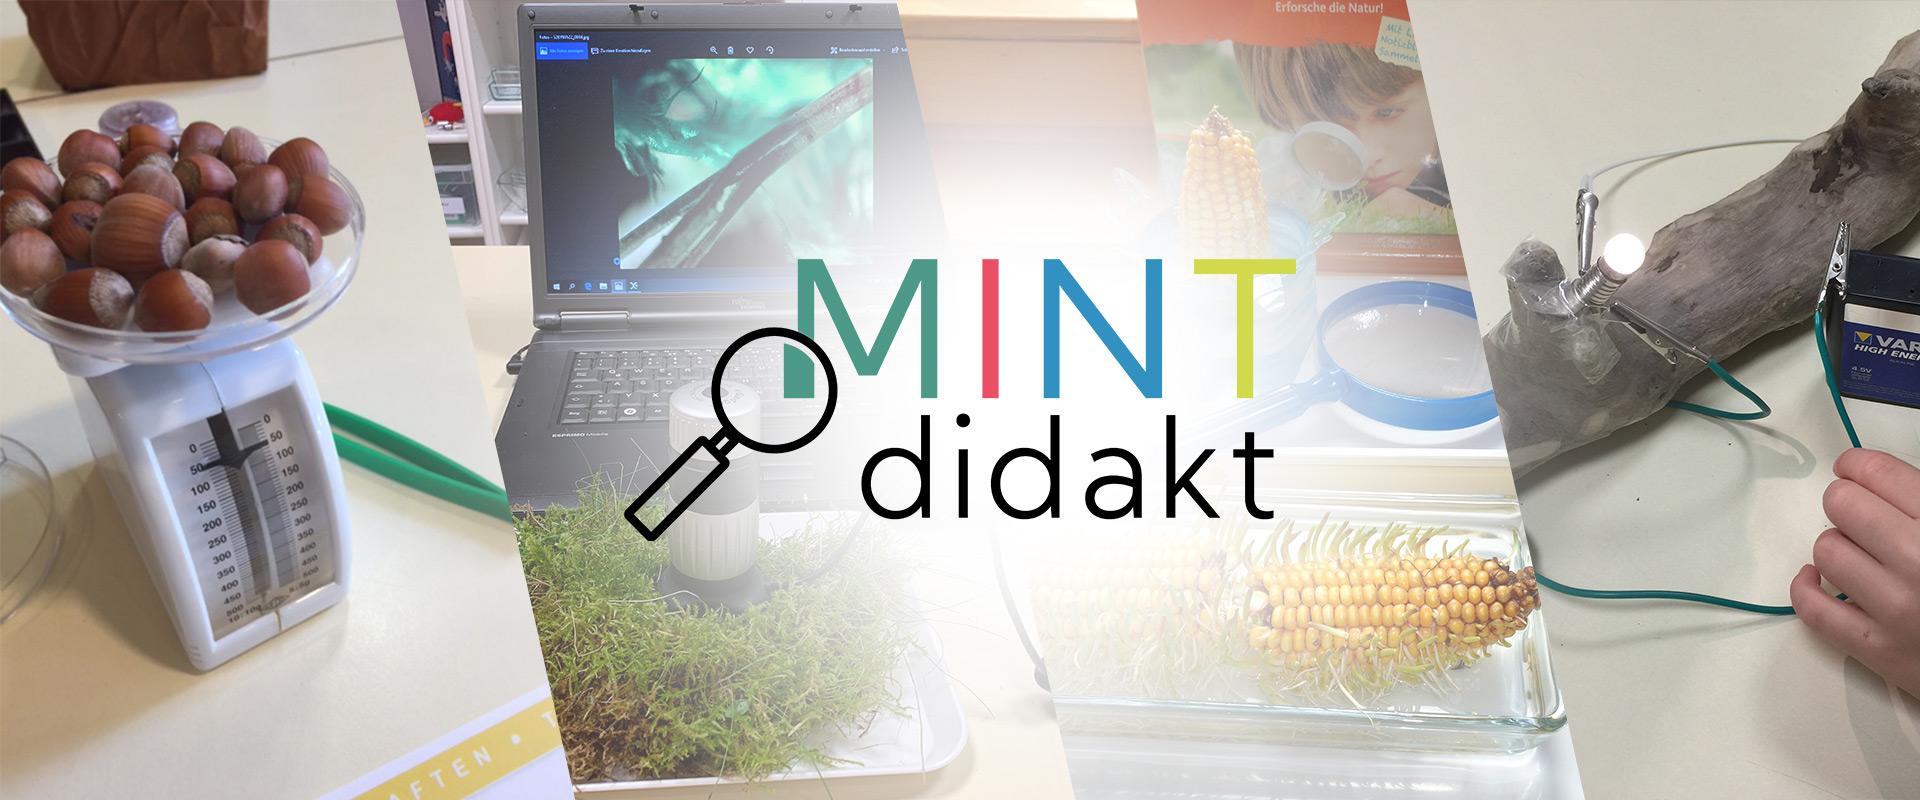 Headerbild - MINT Disziplinen überlagert mit MINTdidakt Logo